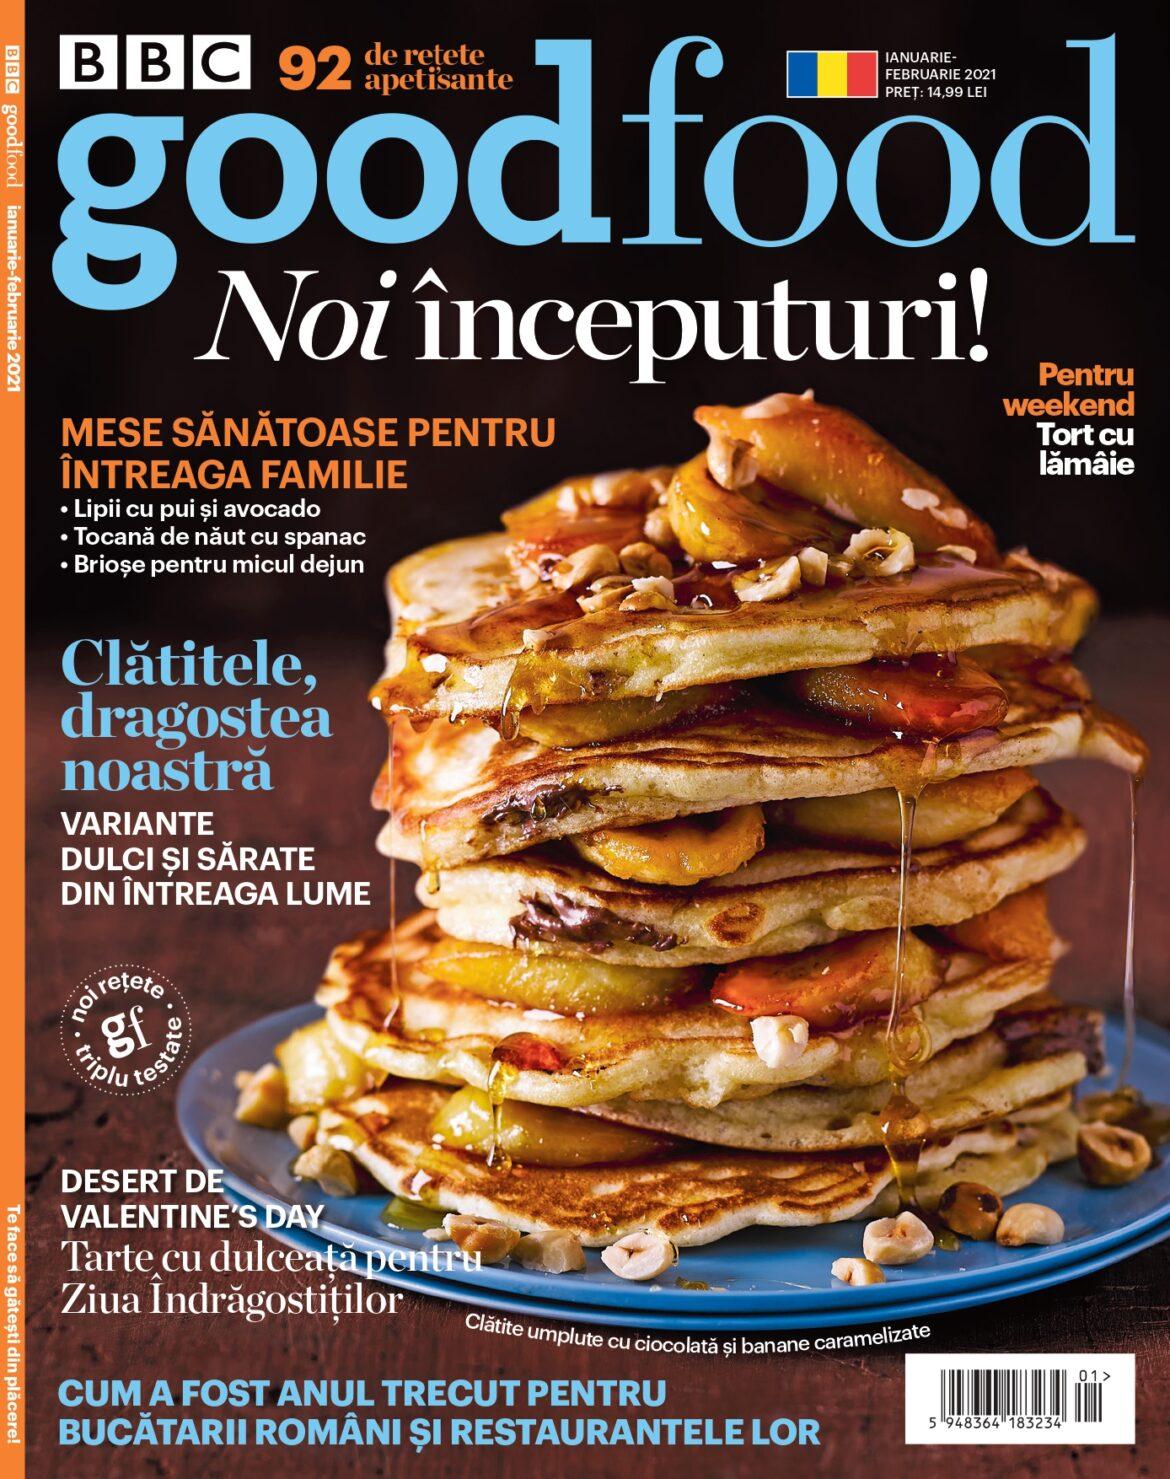 Revista BBC Good Food revine în România